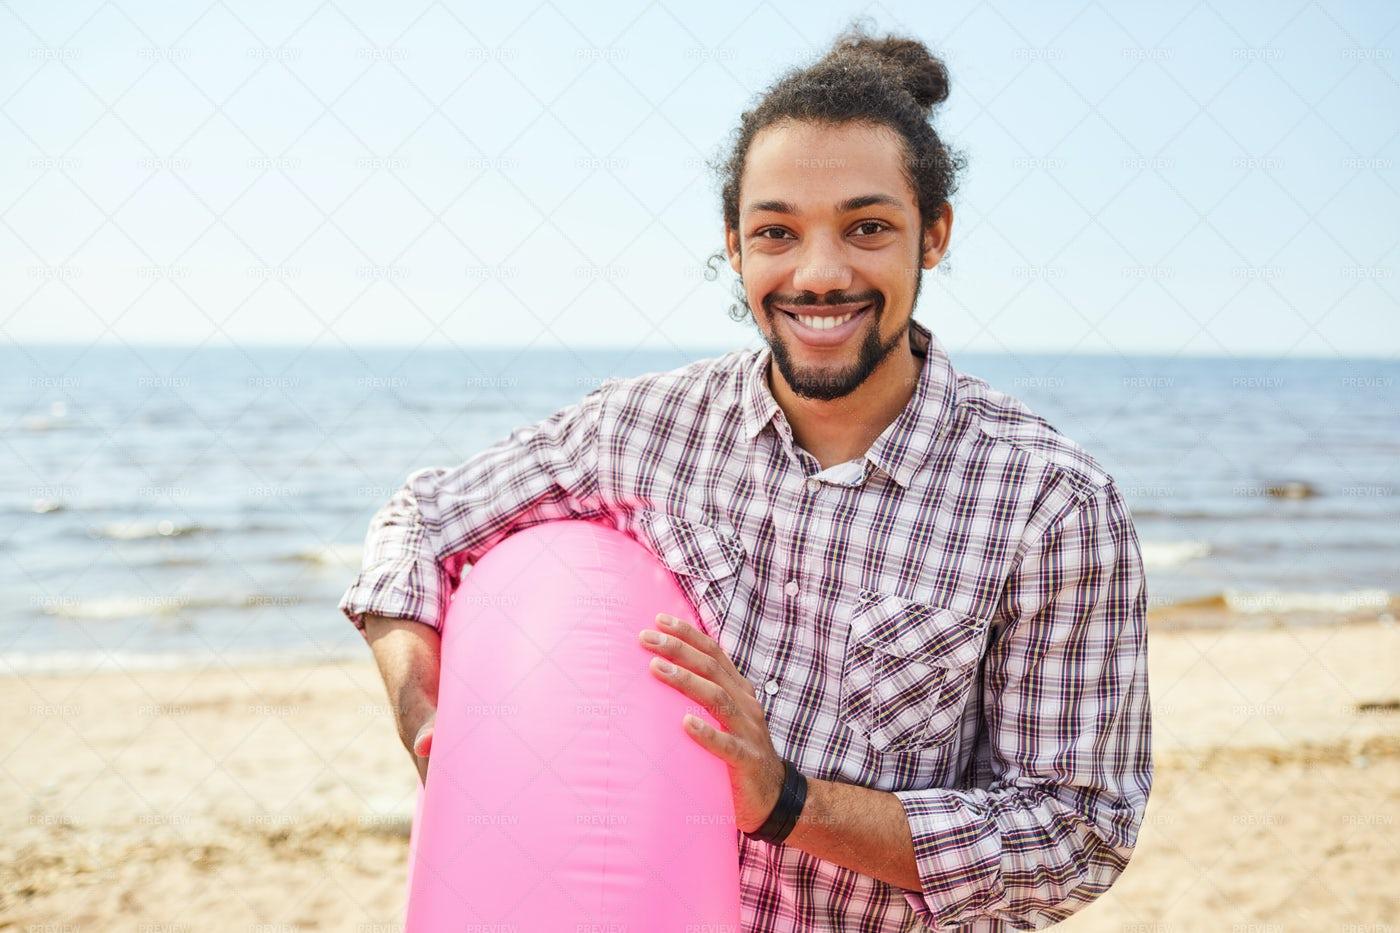 Mixed-Race Man Holding Swim Tube At...: Stock Photos